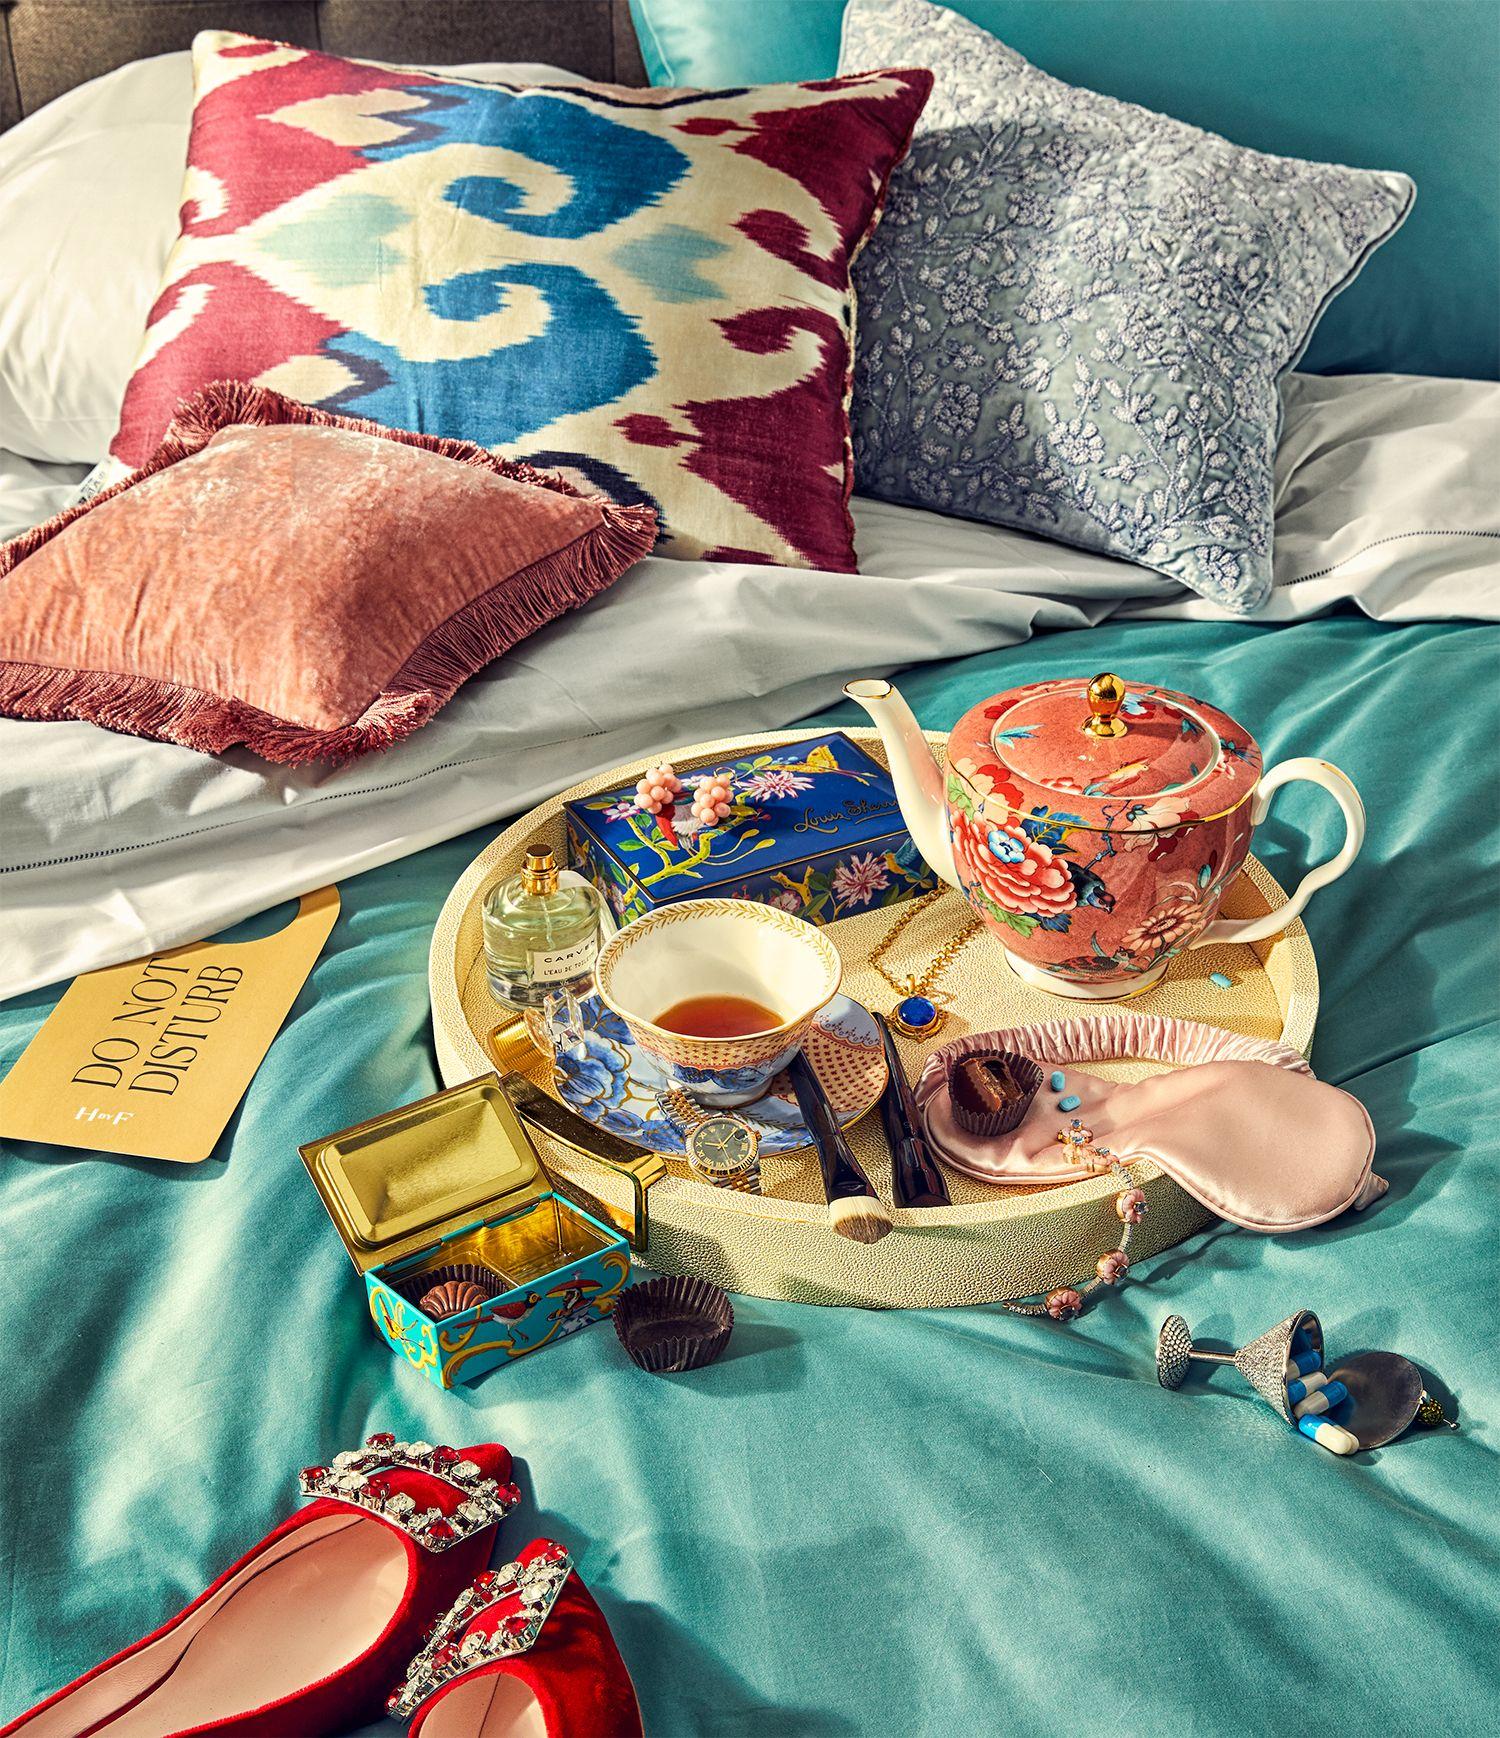 10 Best Cooling Sheet Sets Best Sheets For Summer Sleeping